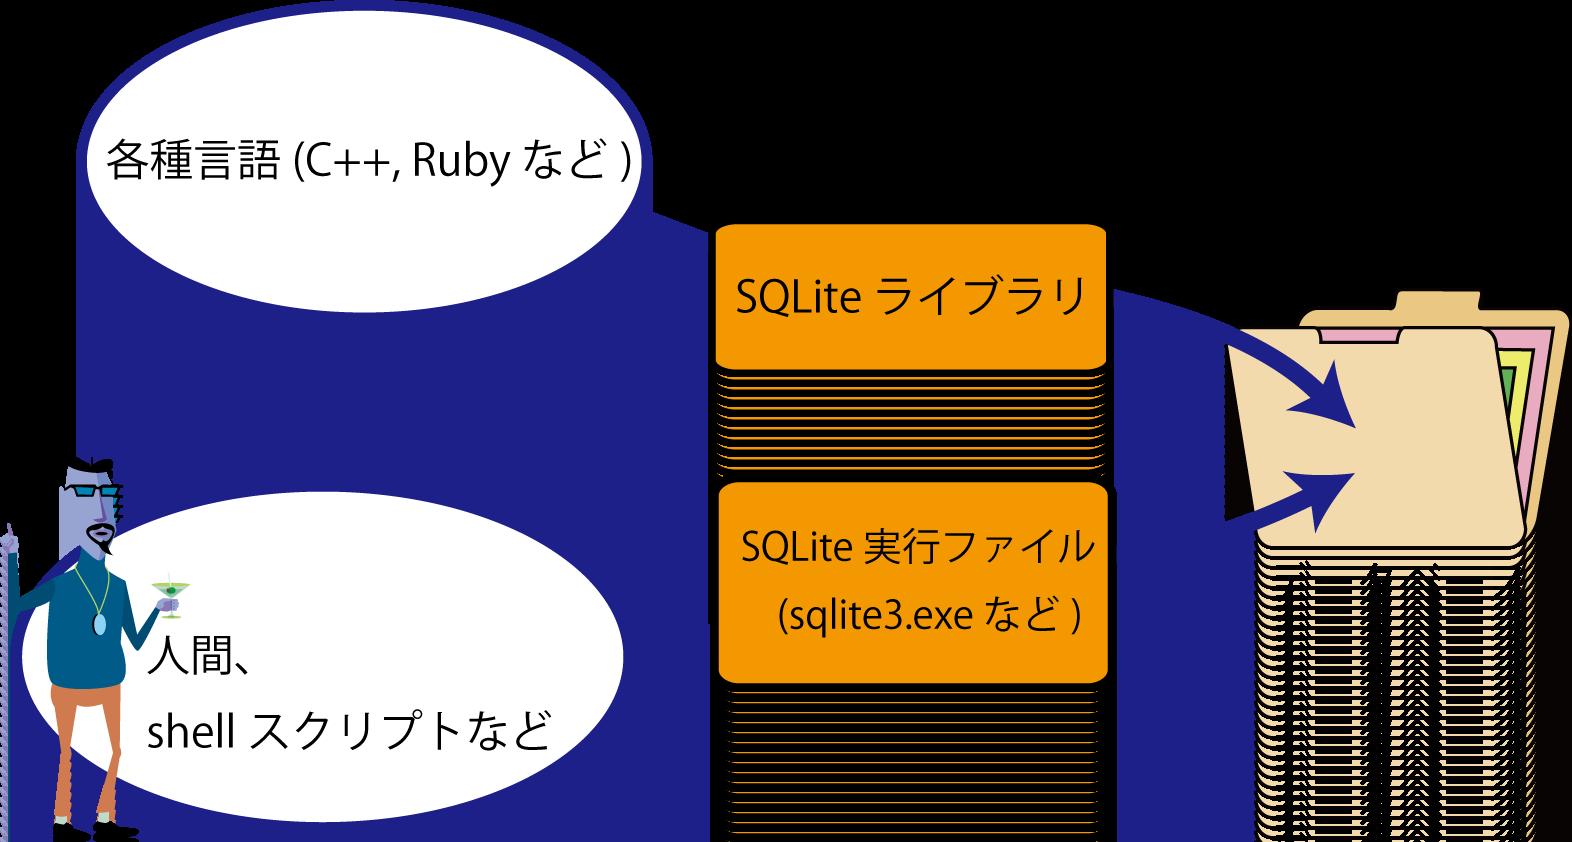 how-to-treat-db-via-sqlite.png